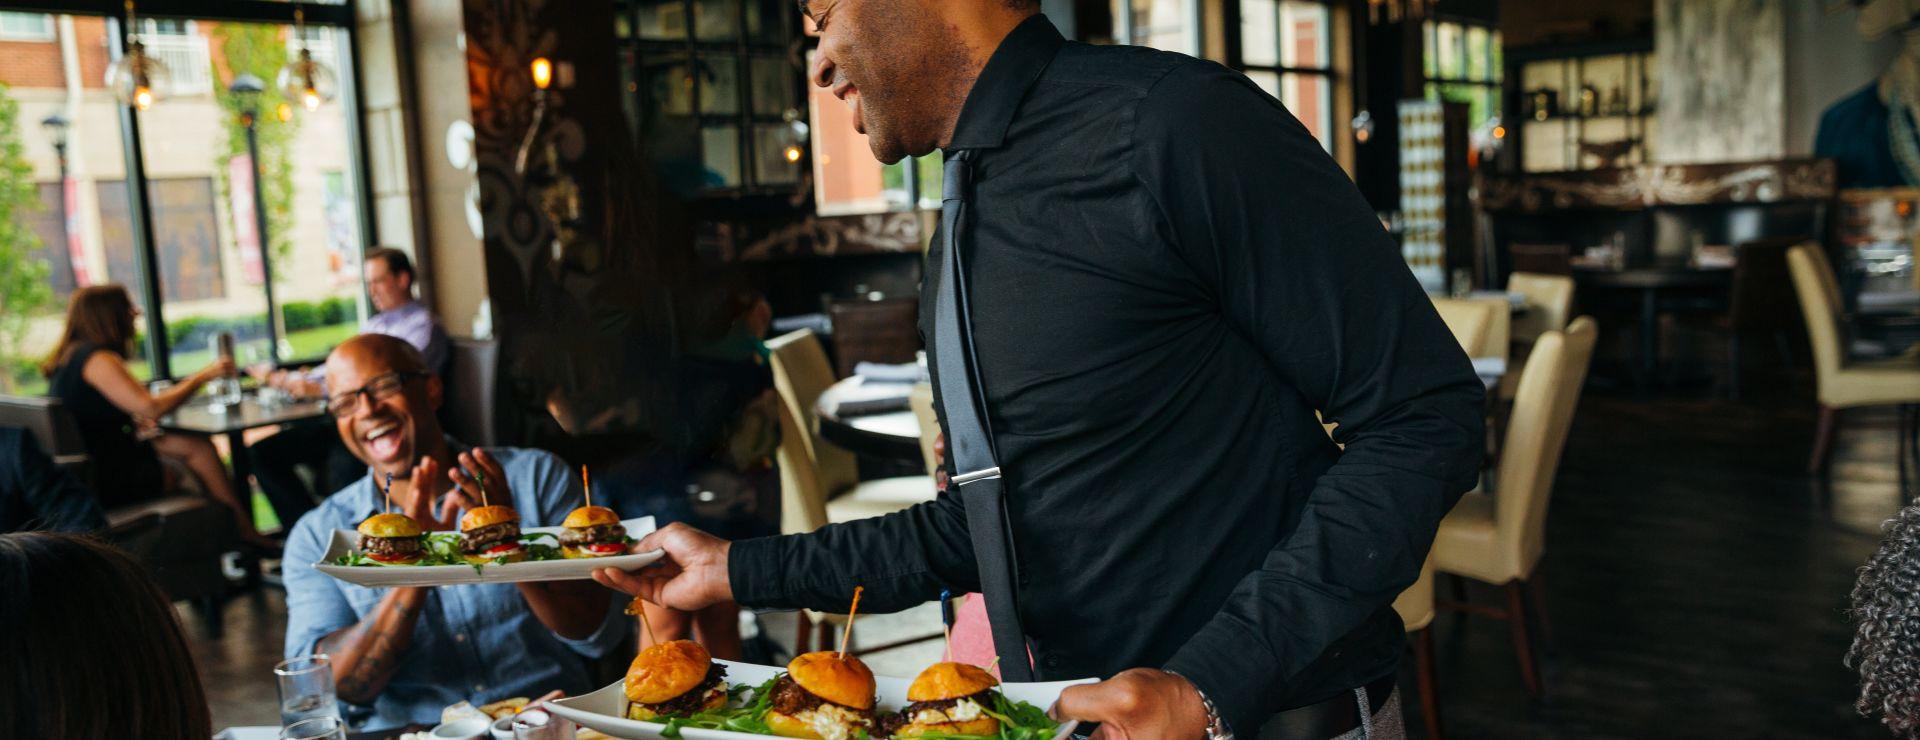 Find Great Columbus Ohio Restaurants